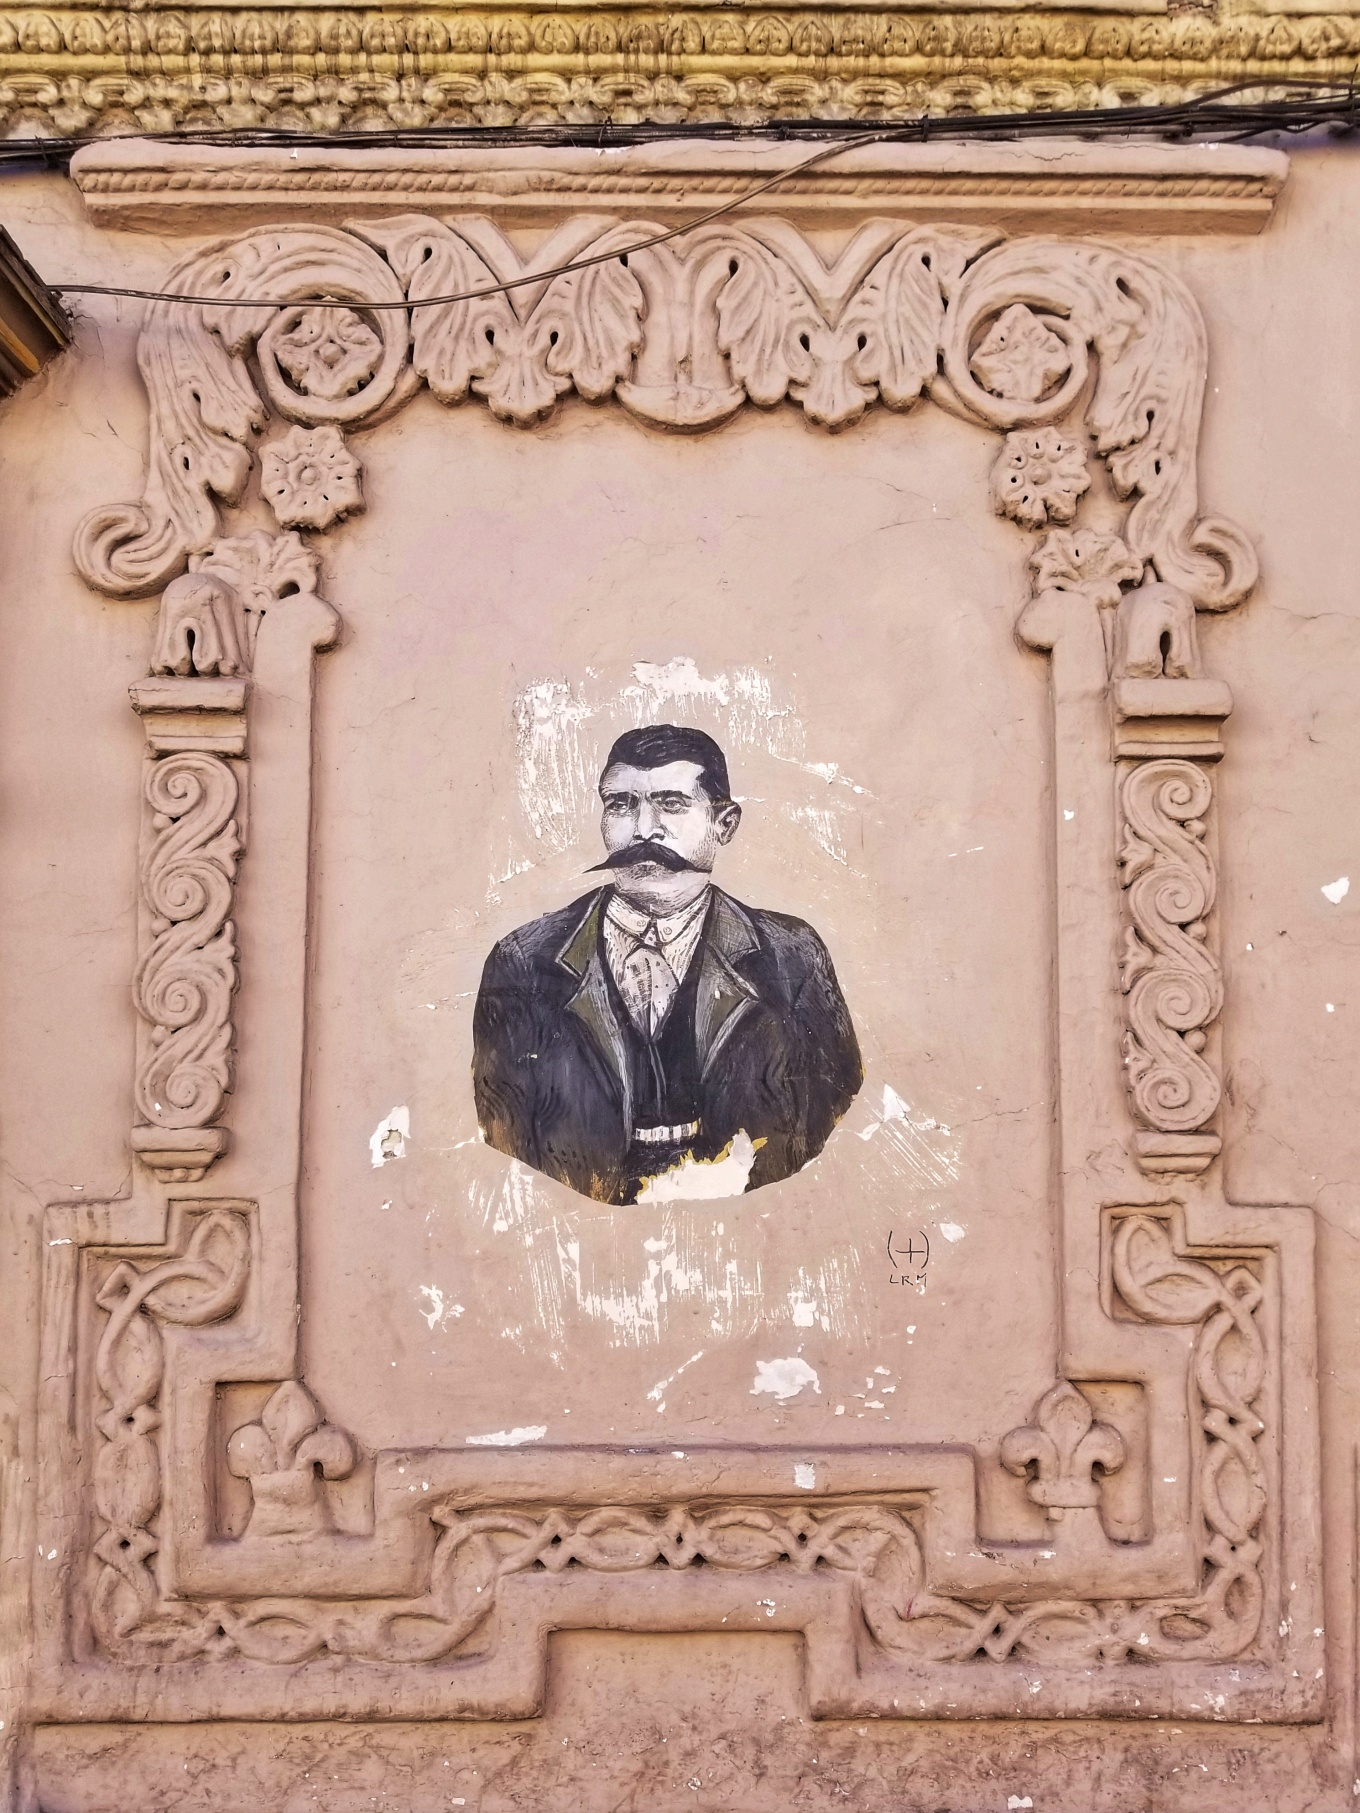 Street art framed gets an architectural upgrade along Calle Larga.